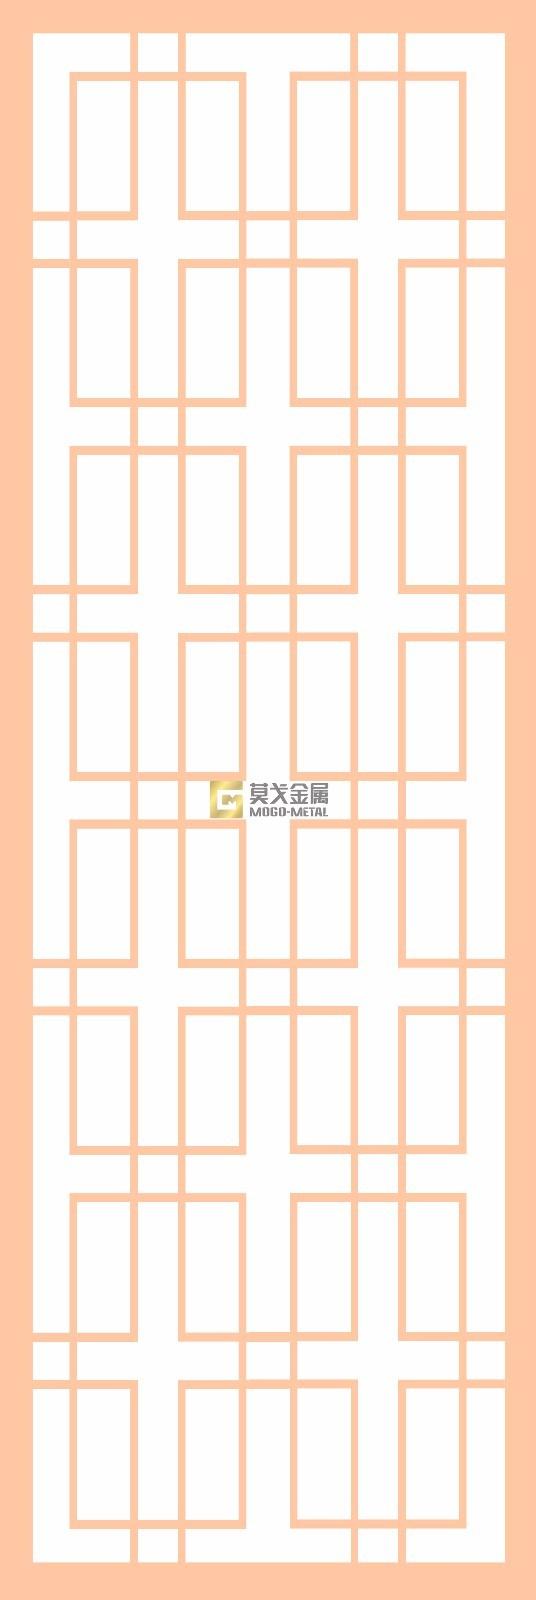 pf002_副本1.jpg